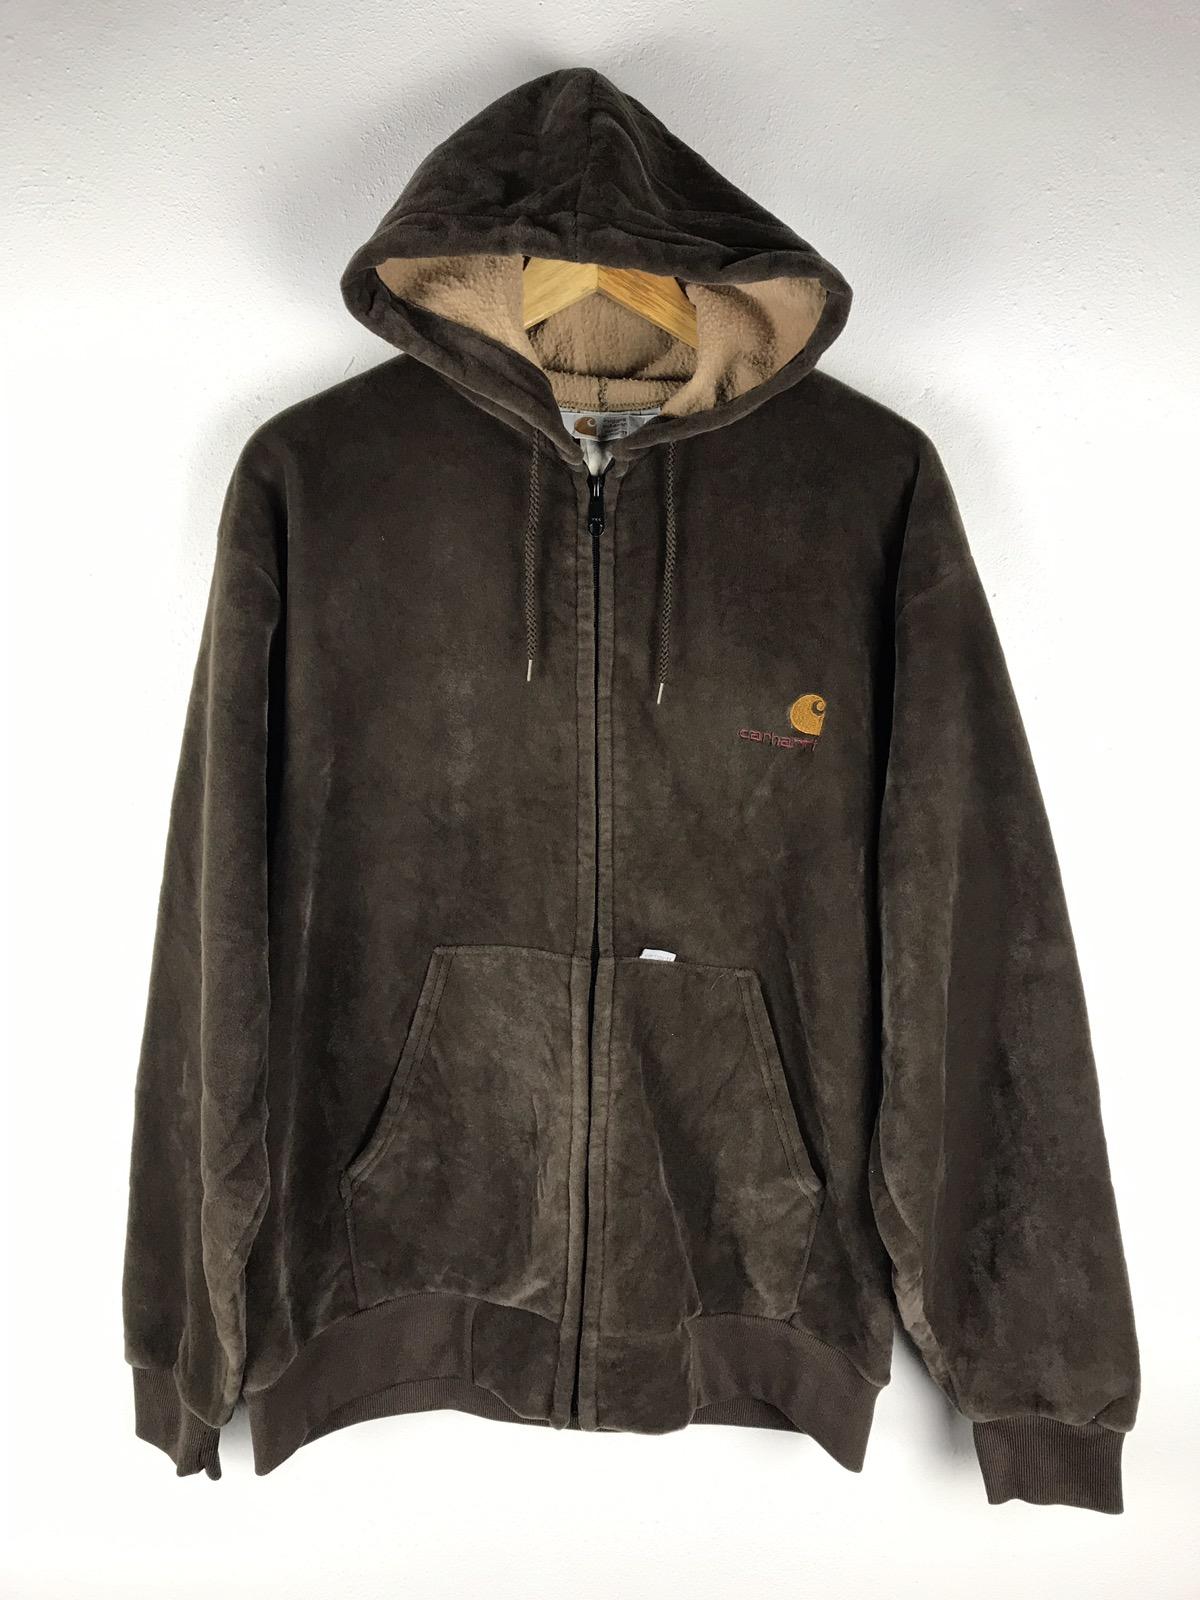 Vintage Carhartt Velvet Hoodies Jacket Rugged Outdoor Wear Made Usa Grailed